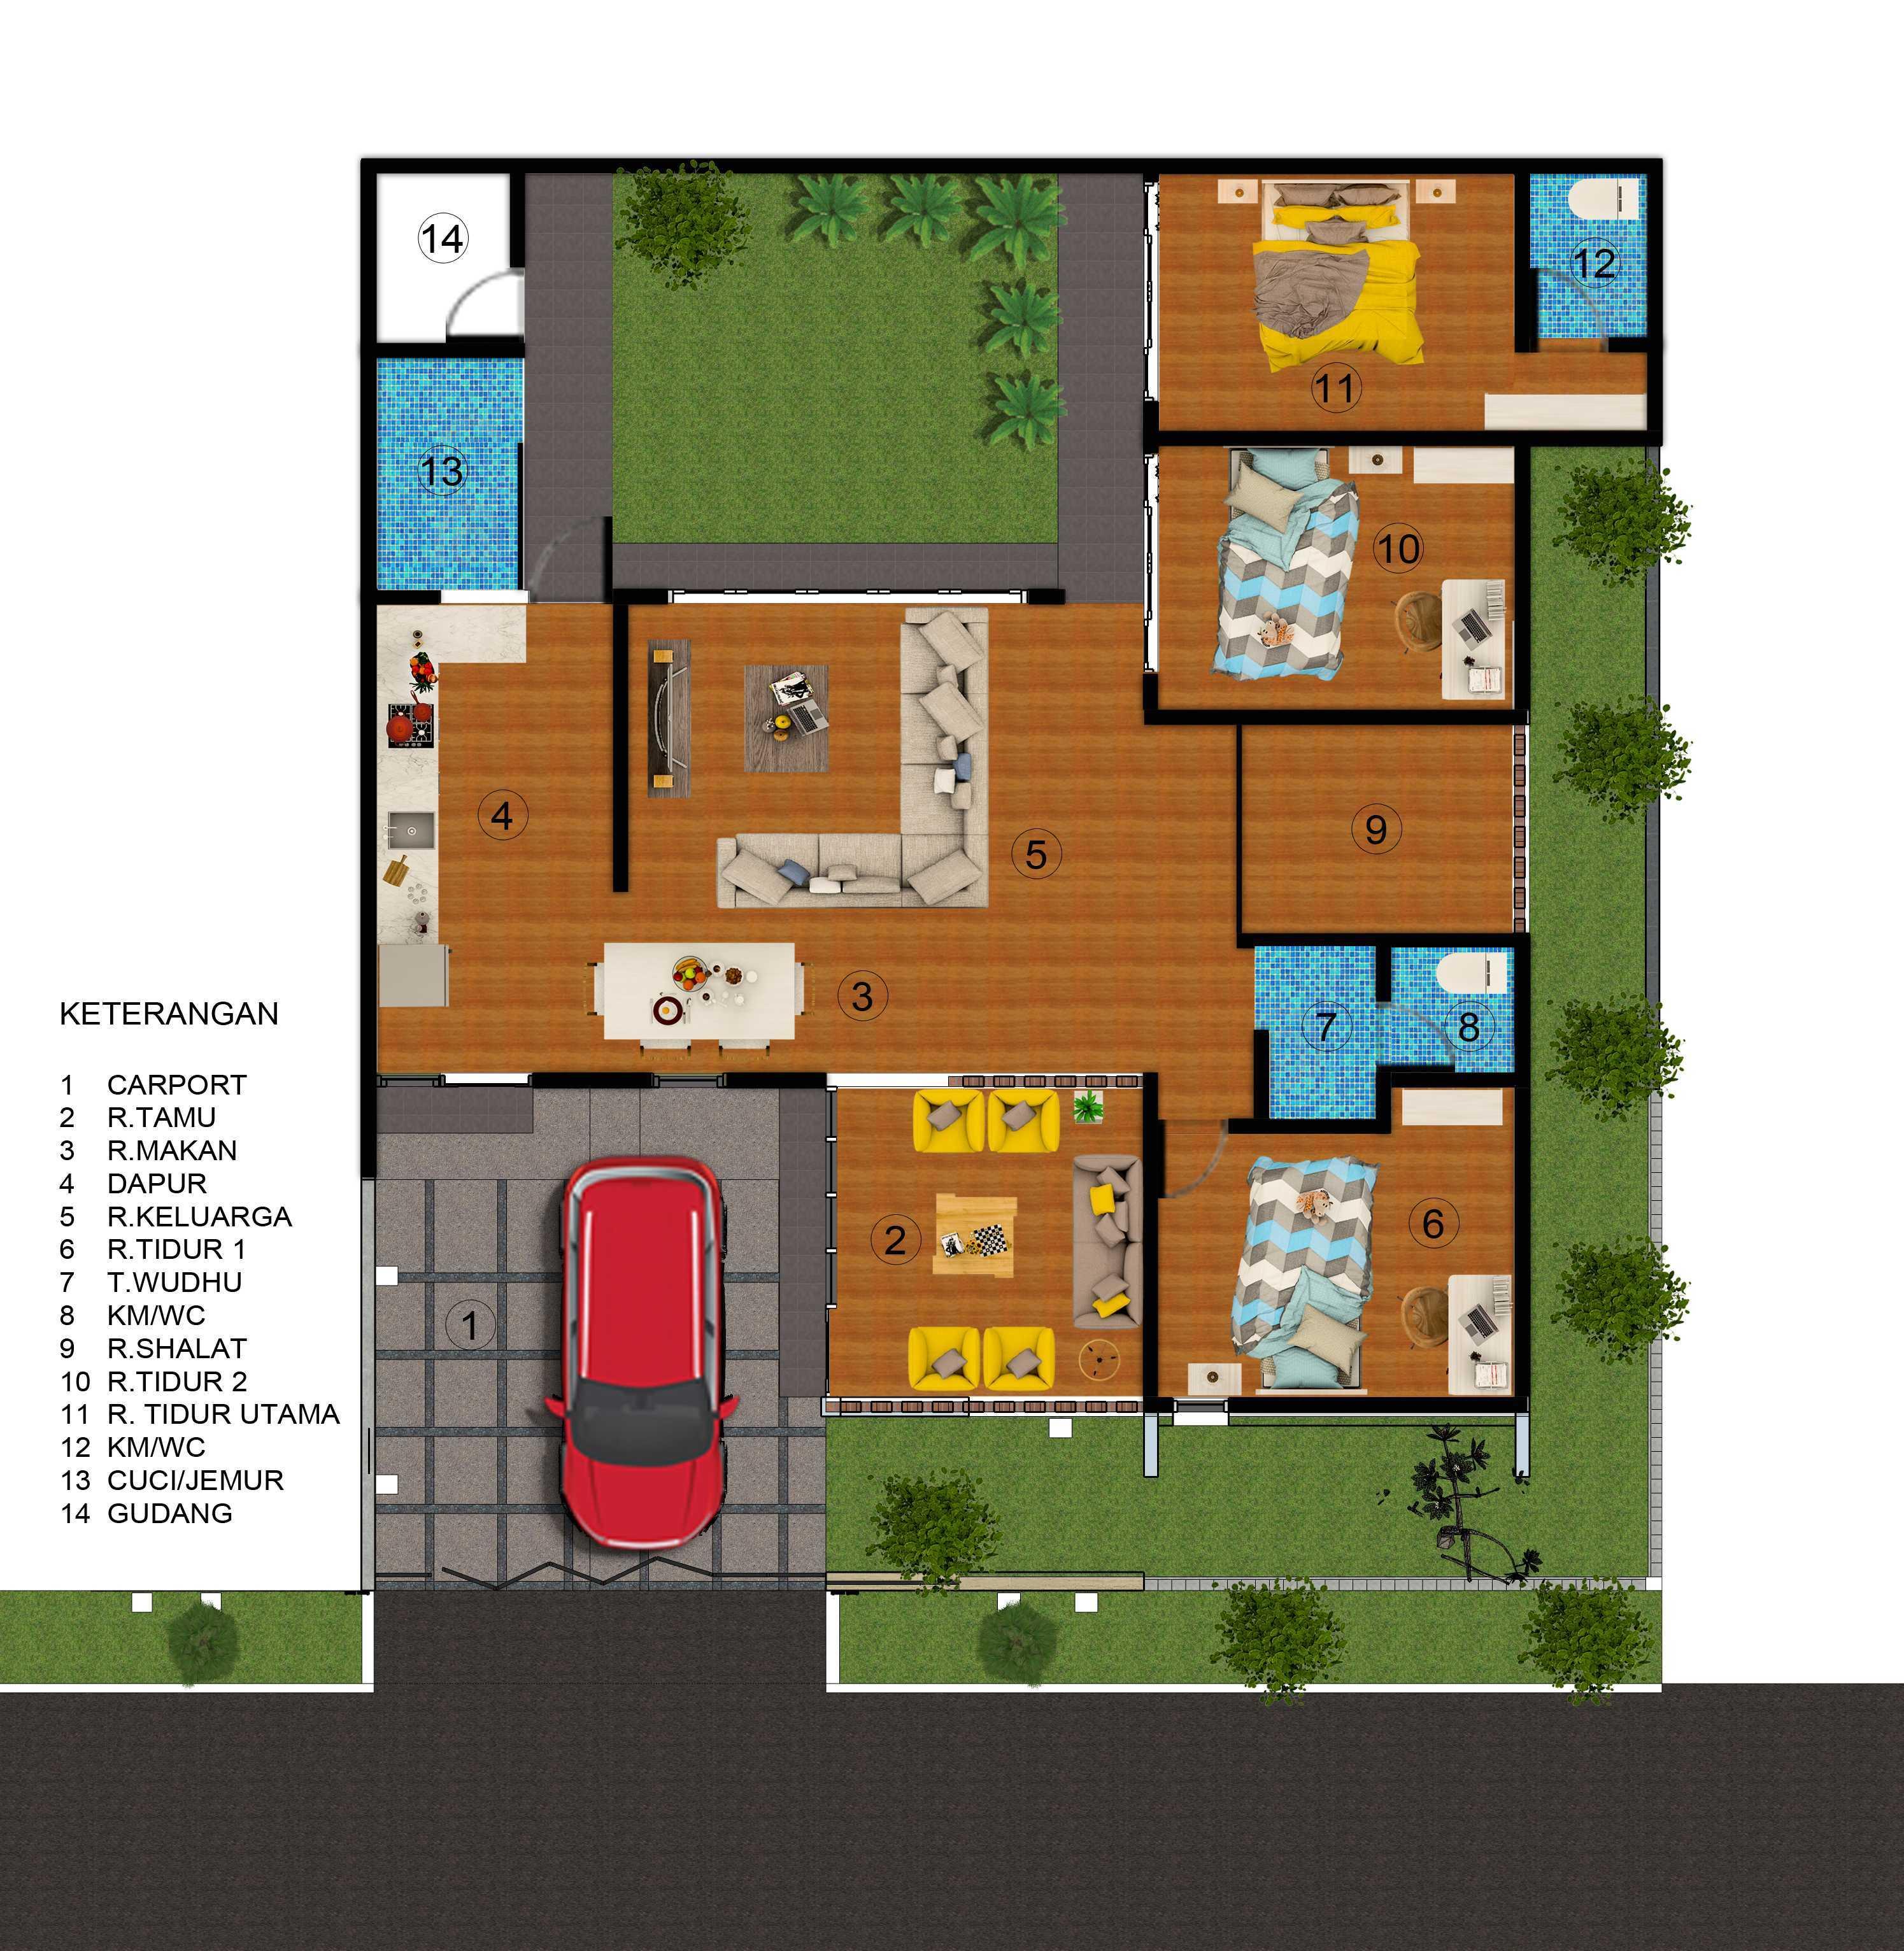 Arsatama Architect K-House - Yogyakarta Kabupaten Sleman, Daerah Istimewa Yogyakarta, Indonesia Yogyakarta, Indonesia Denah-K-House Modern,minimalis,kontemporer  23355